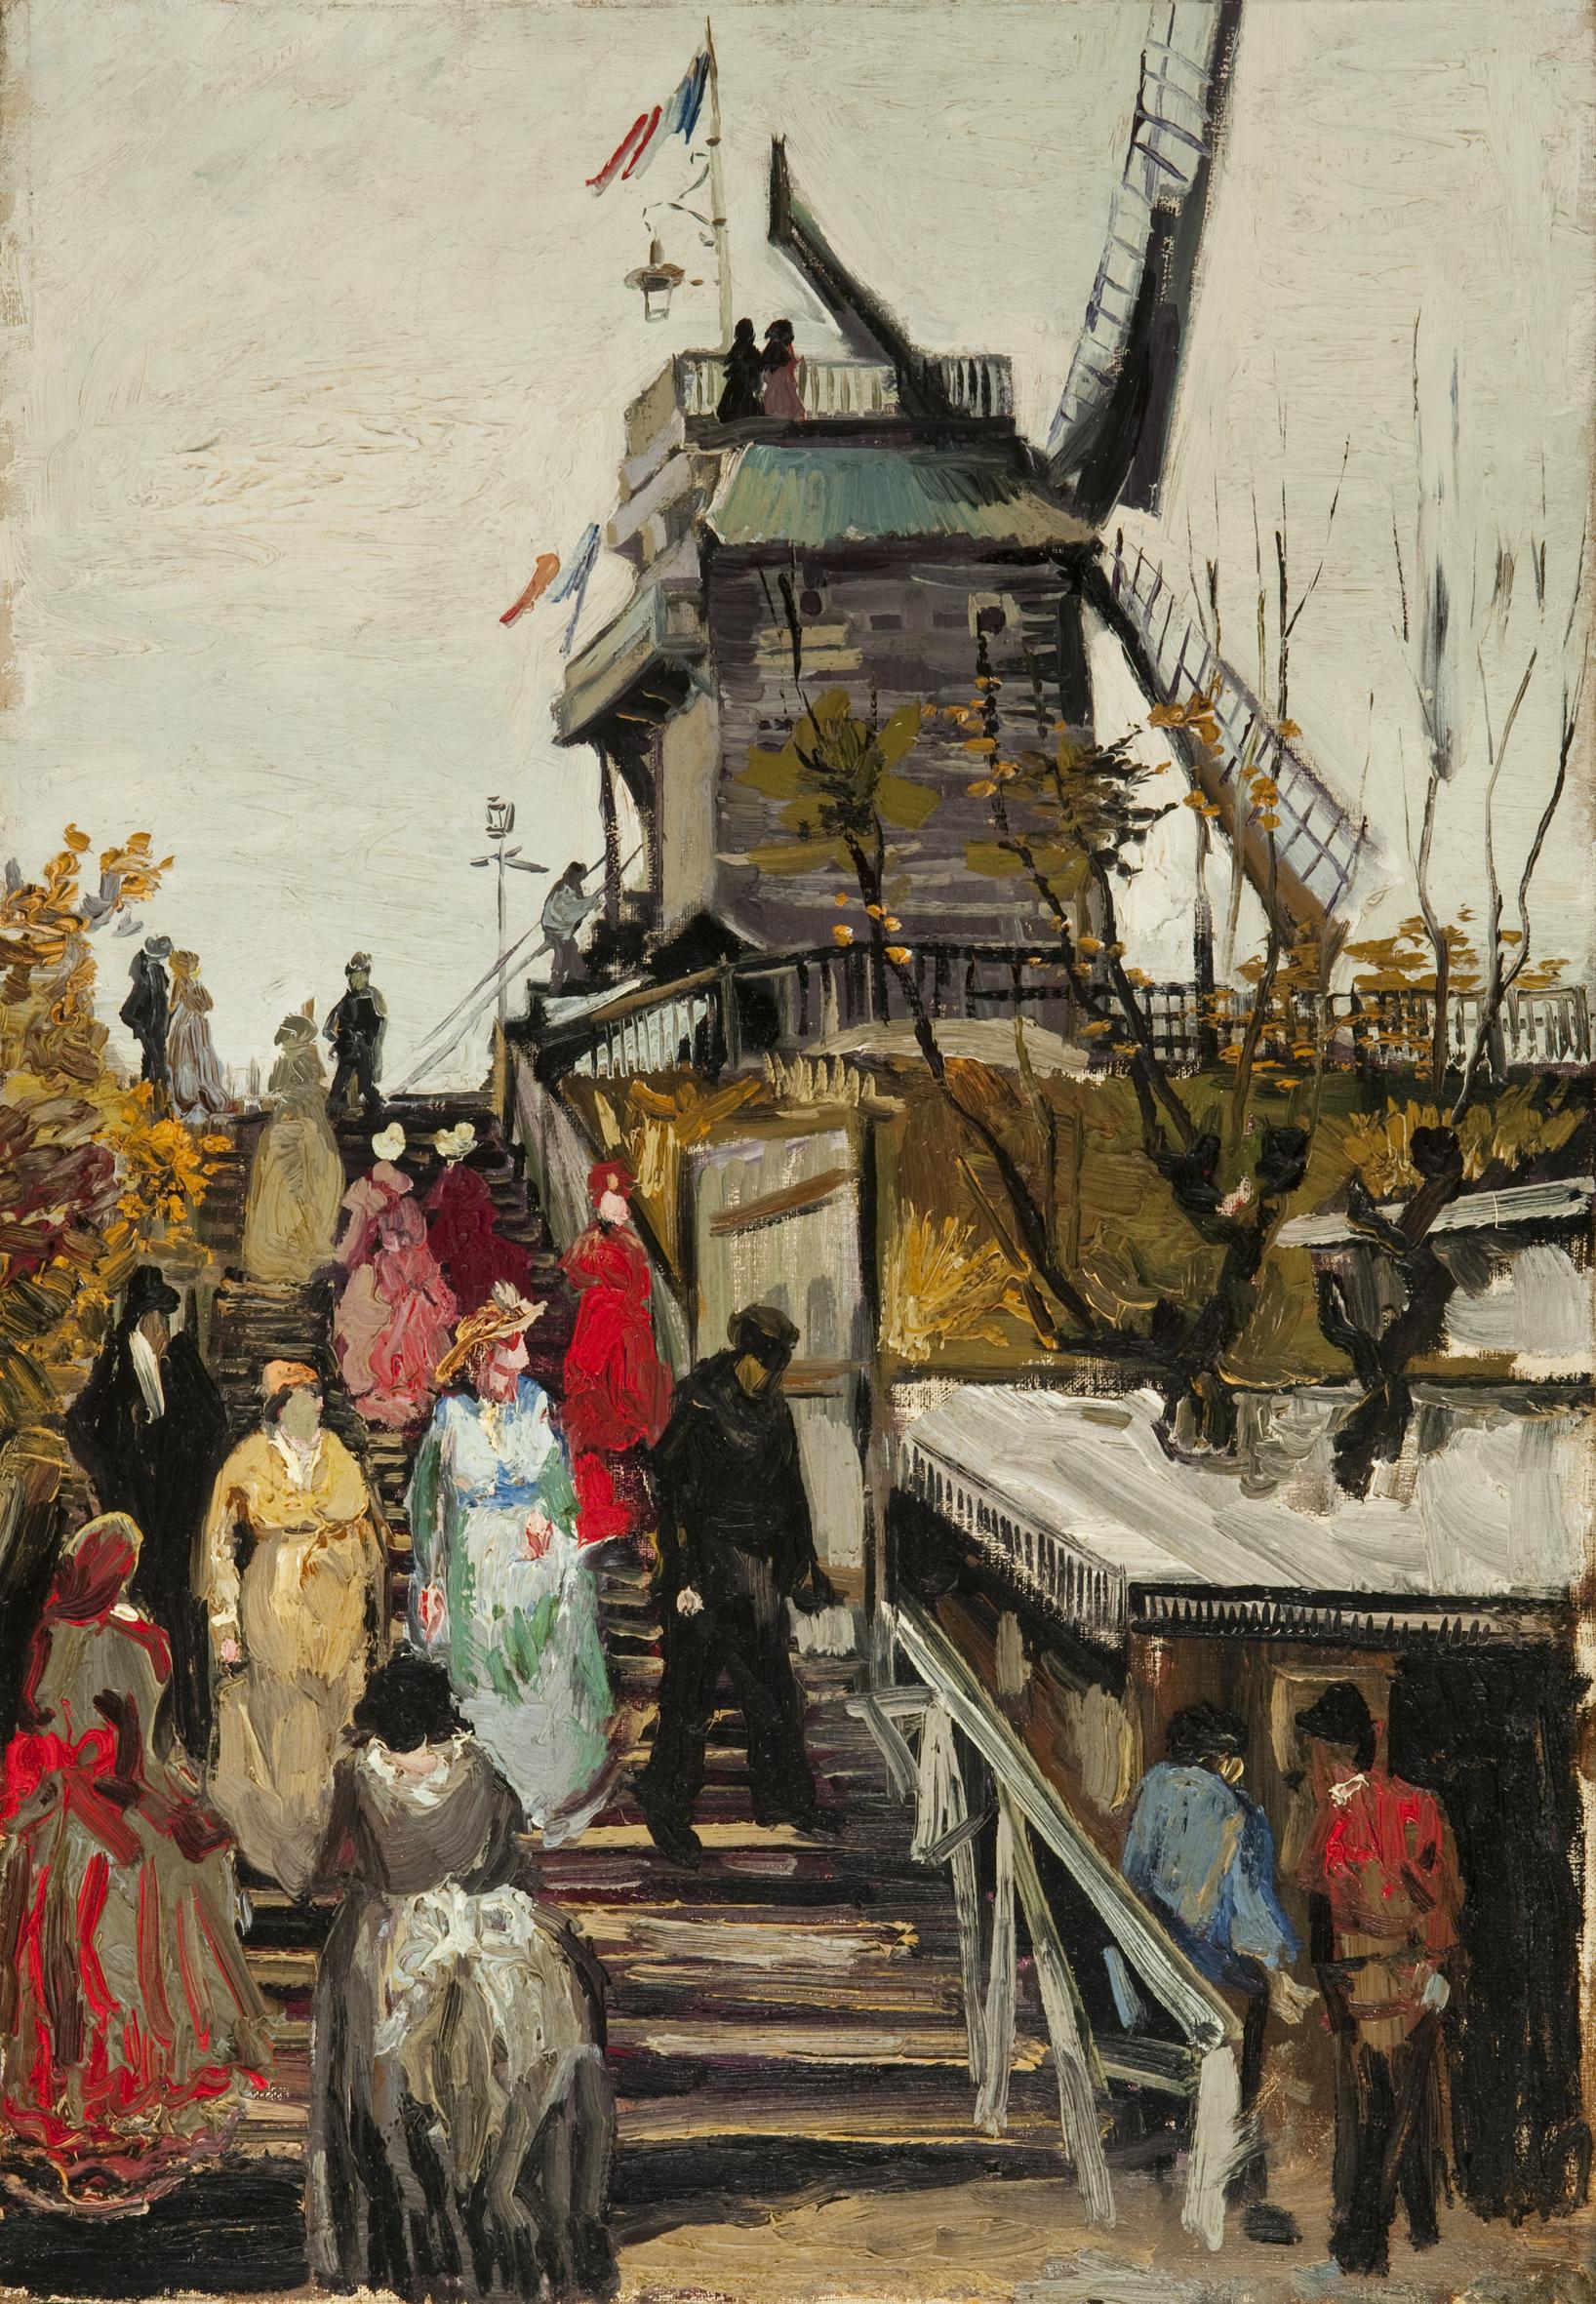 http://upload.wikimedia.org/wikipedia/commons/3/3f/Vincent_van_Gogh_-_Le_Moulin_de_blute-fin%281886%29.jpg